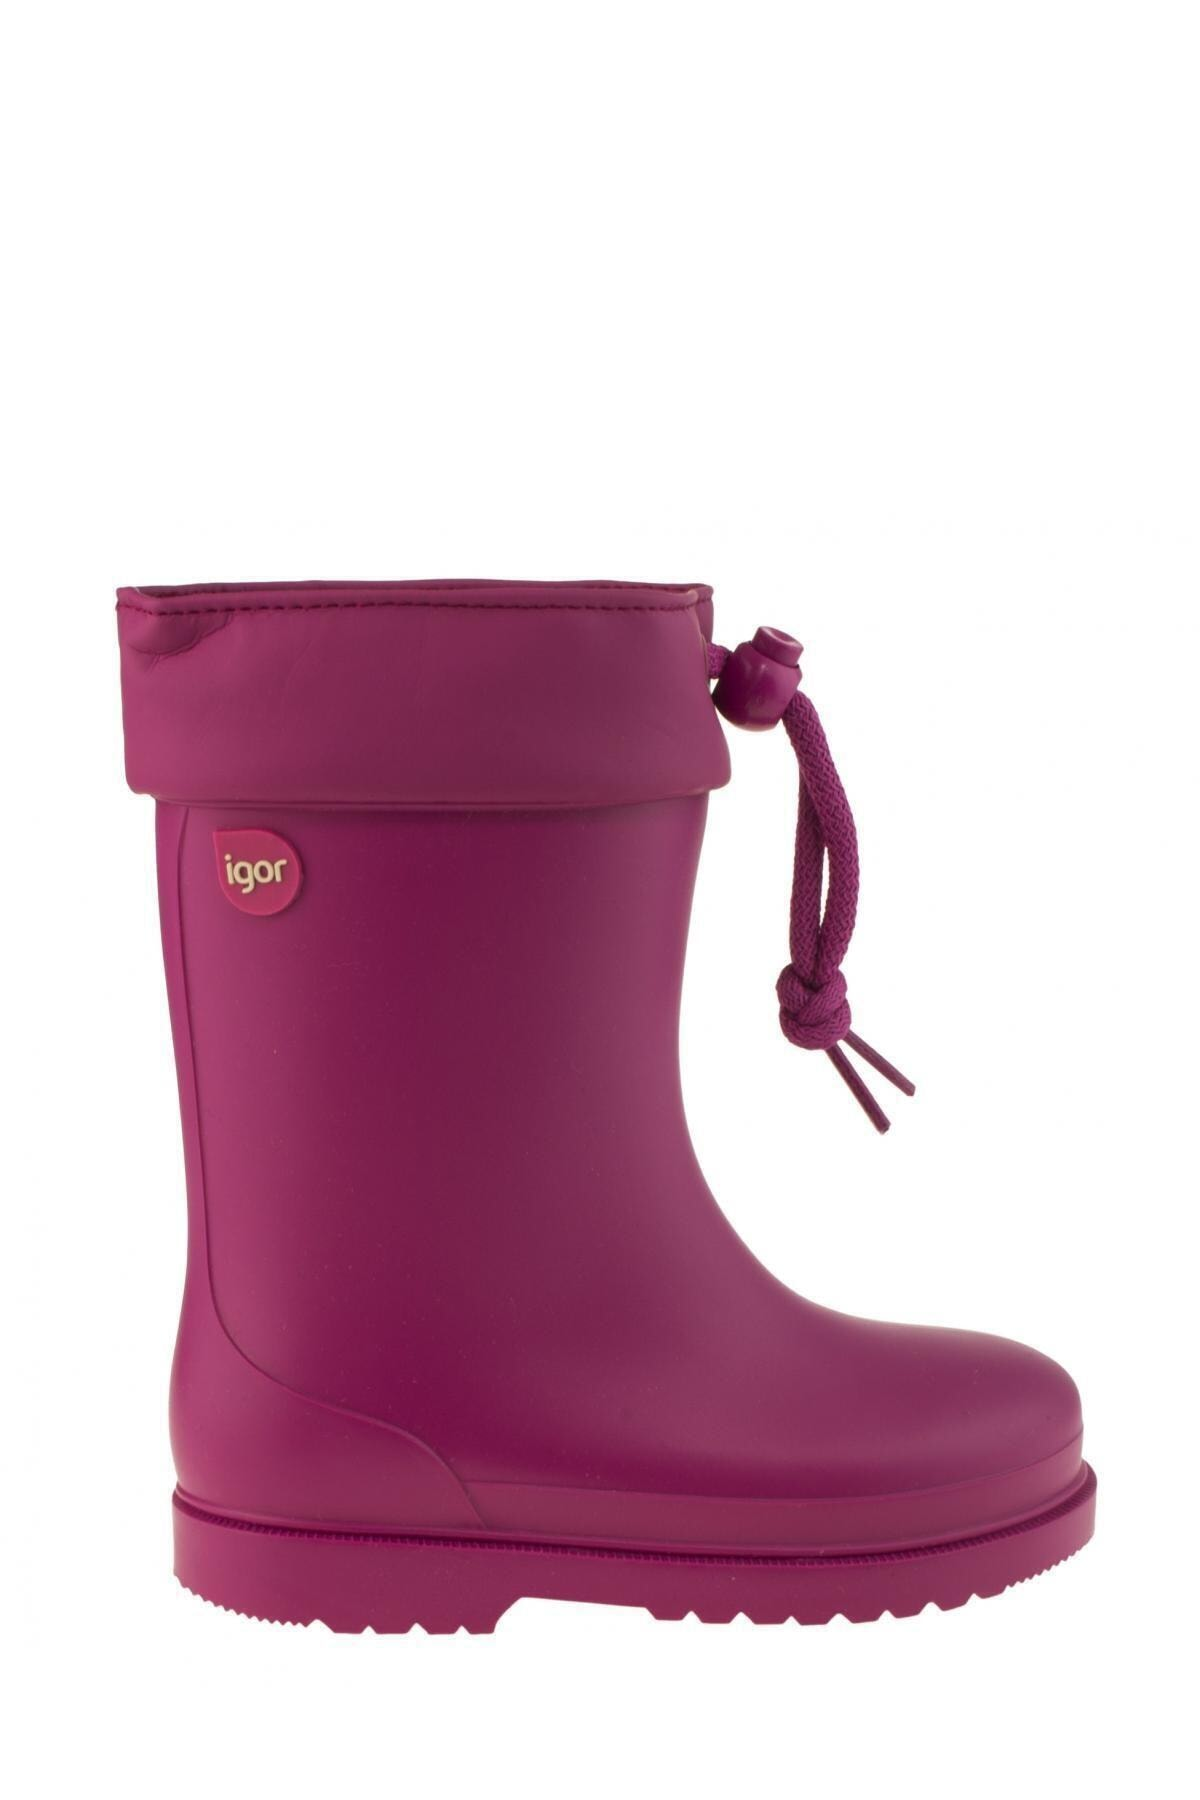 IGOR CHUFO CUELLO Fuşya Kız Çocuk Yağmur Çizmesi 100386306 2